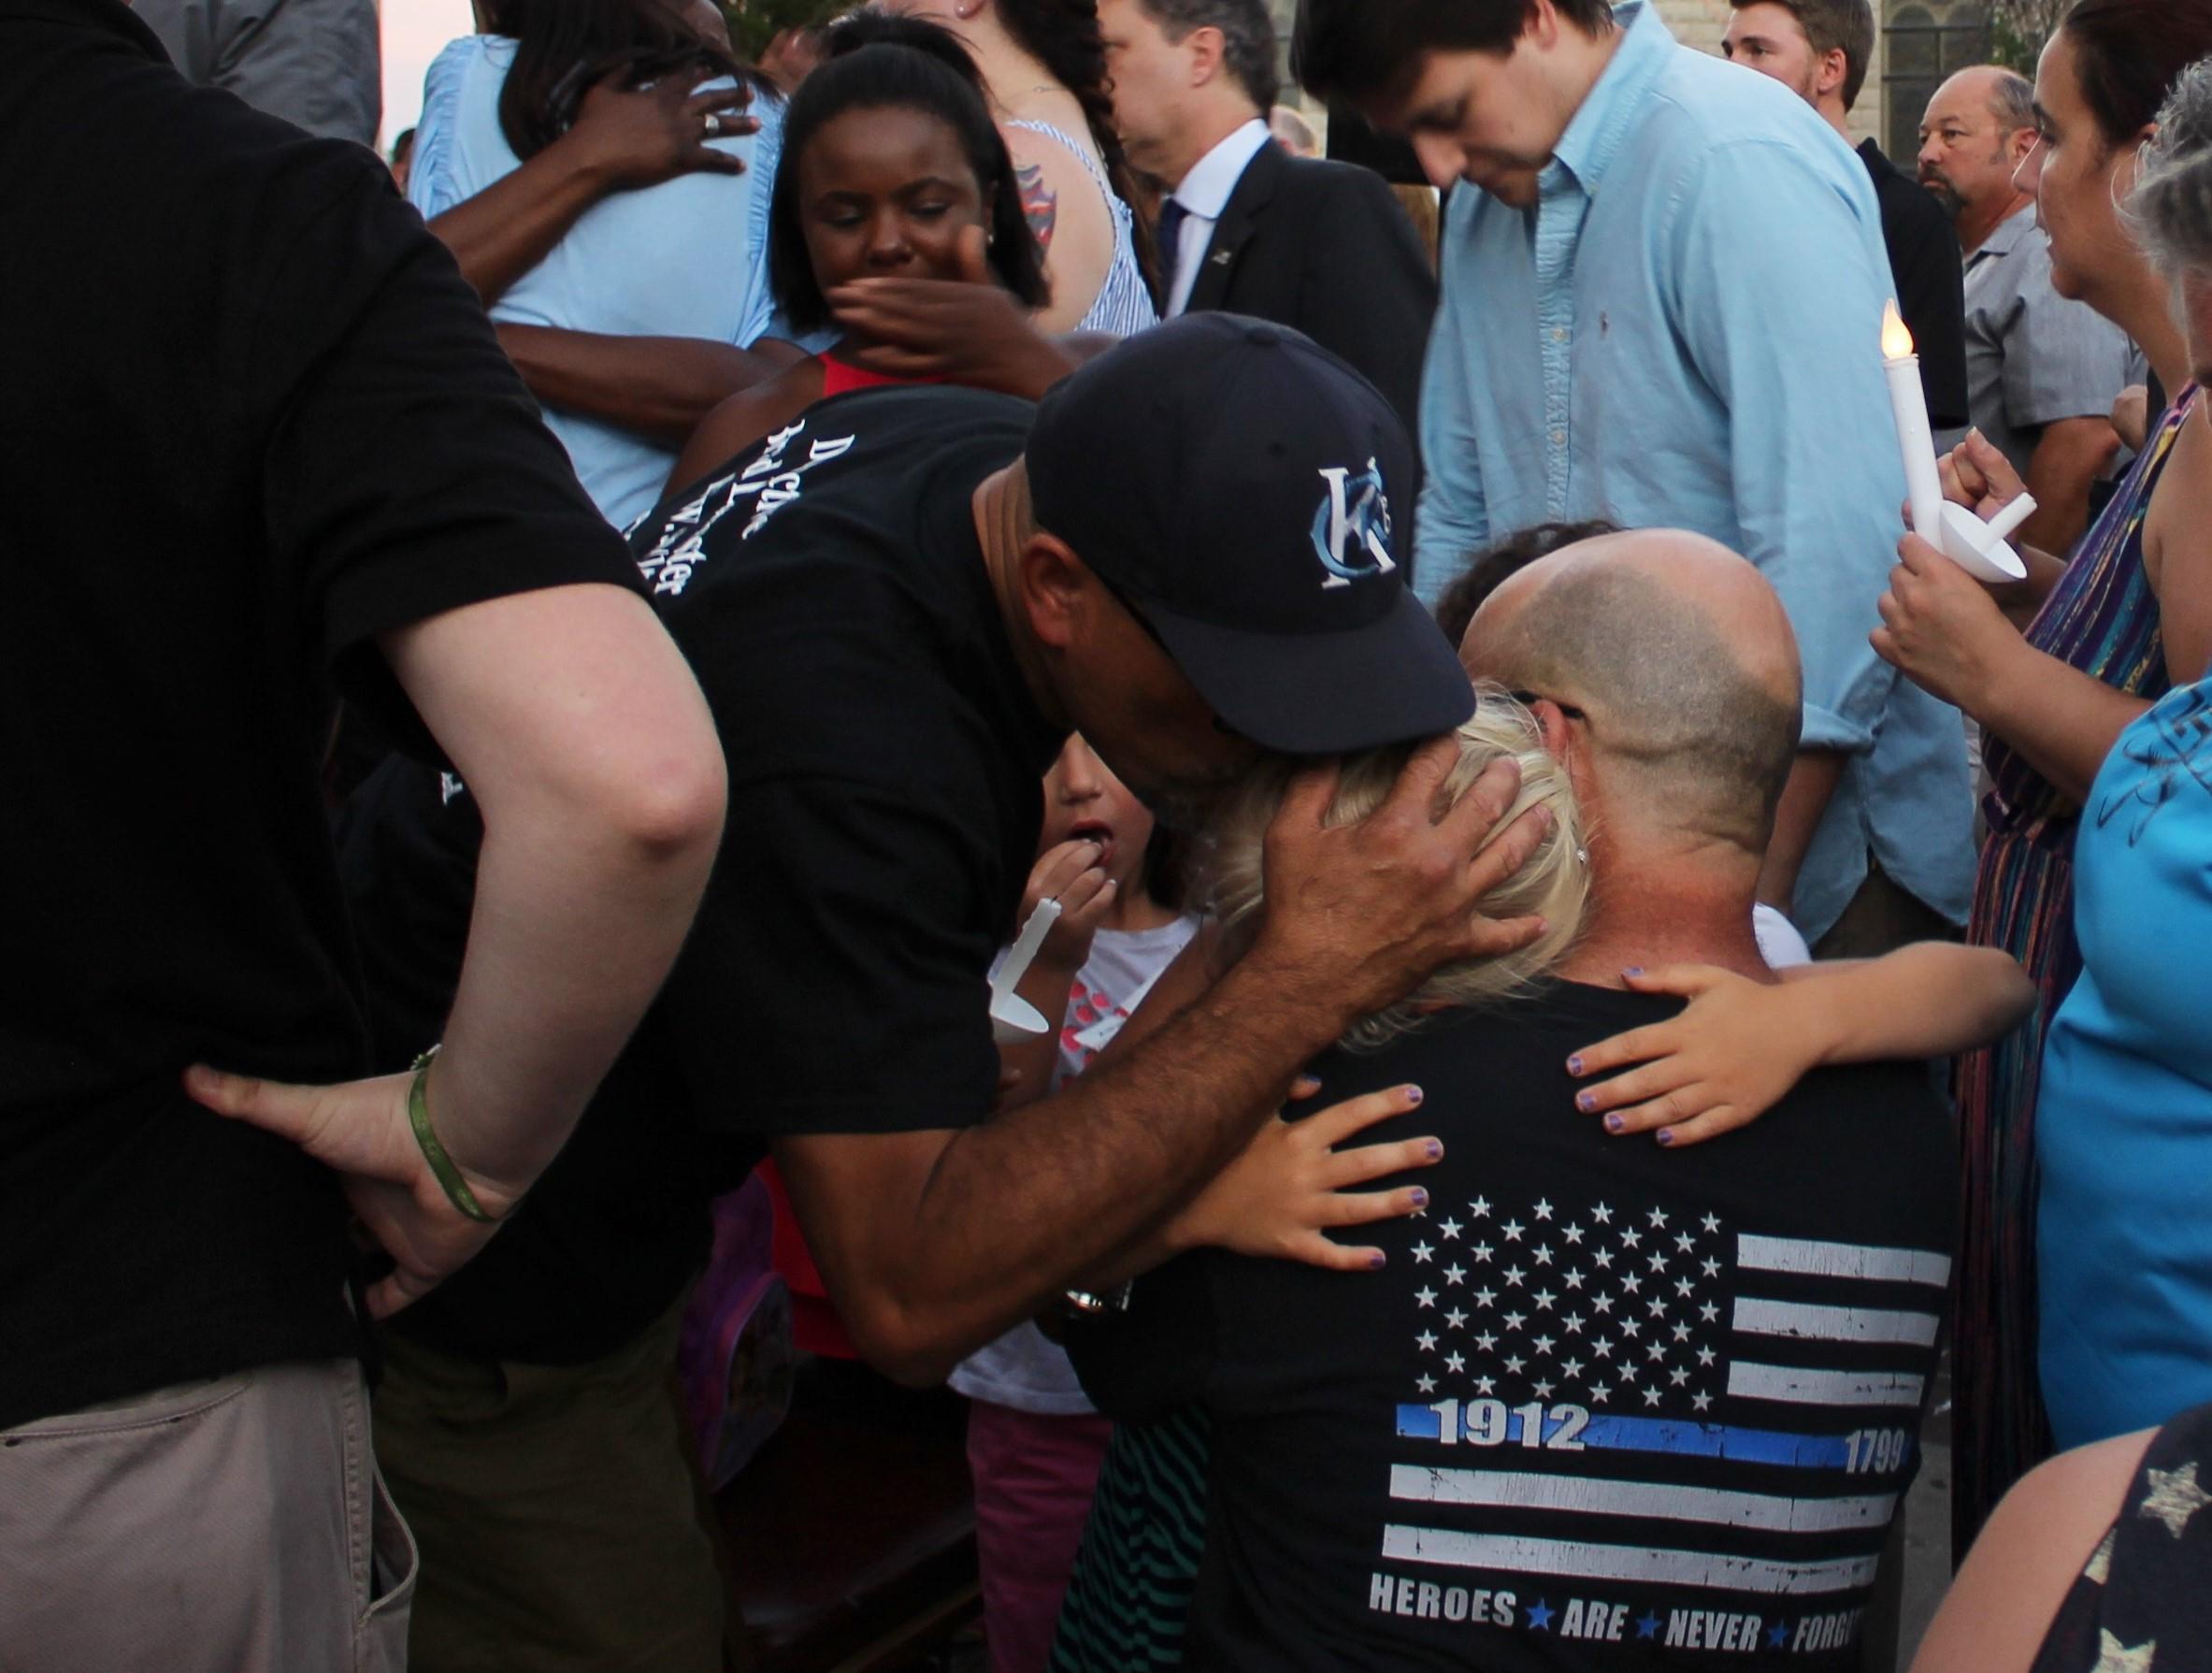 Sorrow But 'Sense Of Pride' At Vigil For Slain Wyandotte